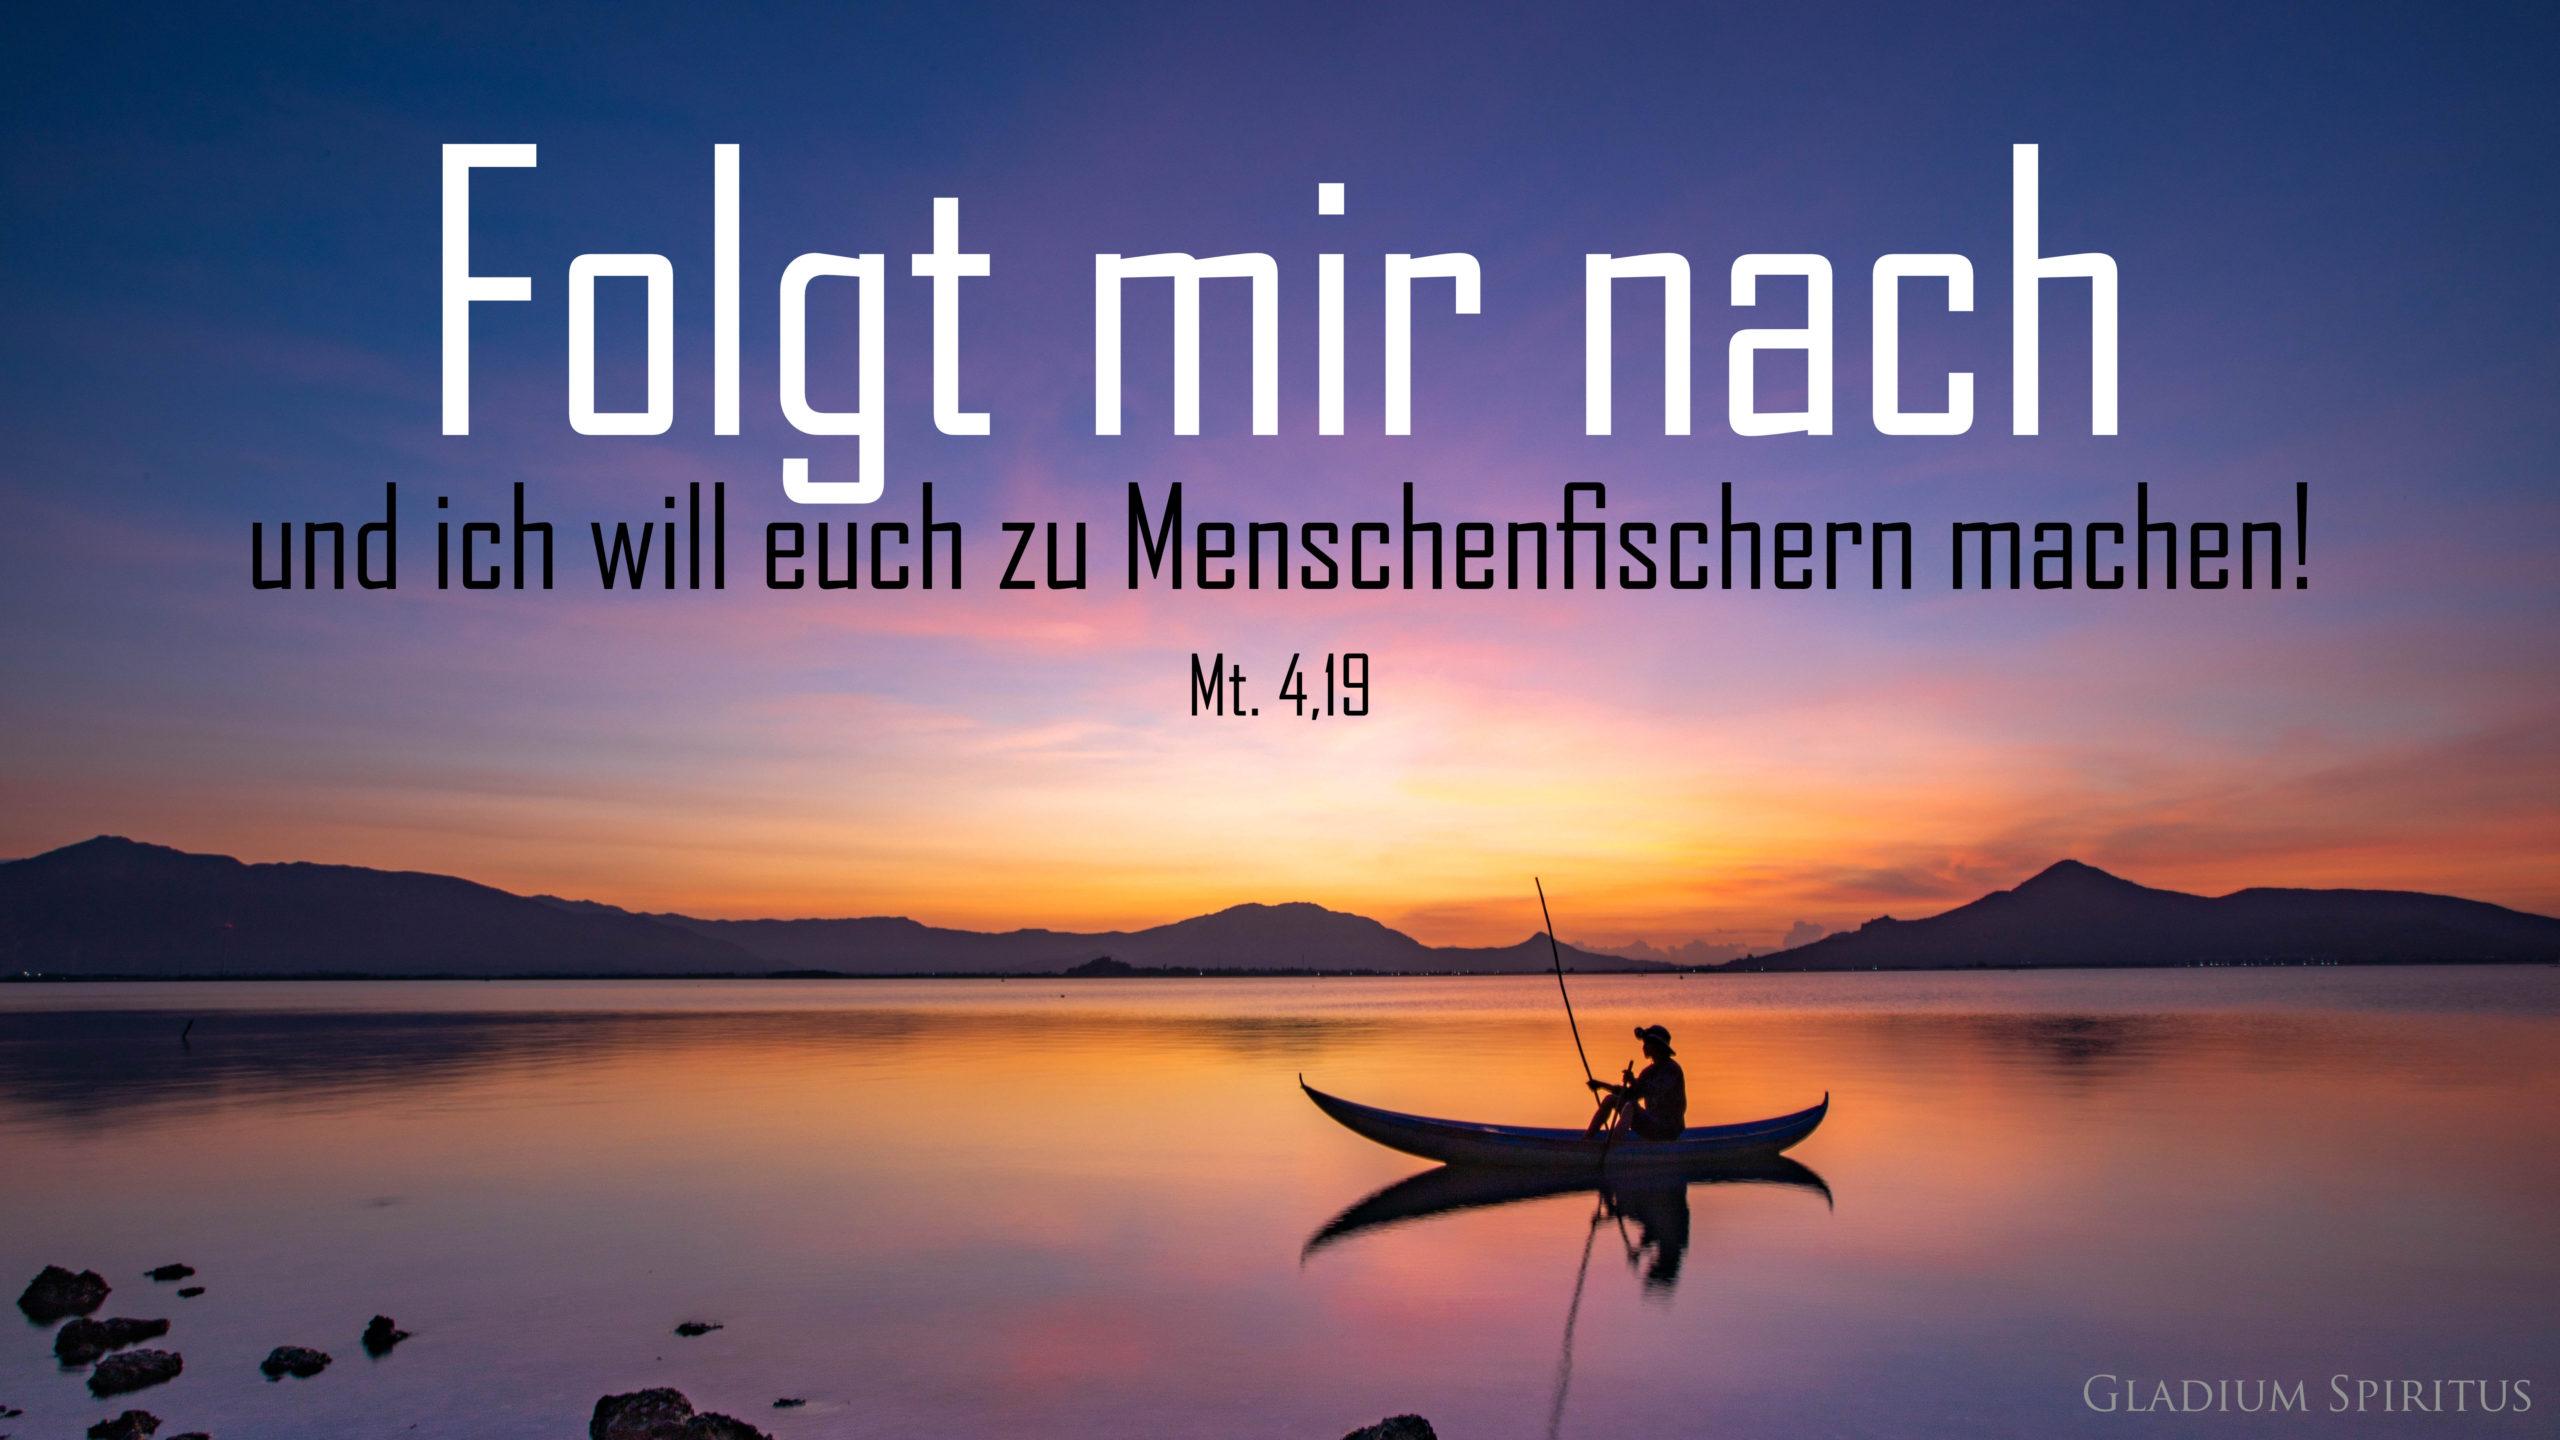 Mt. 4,19